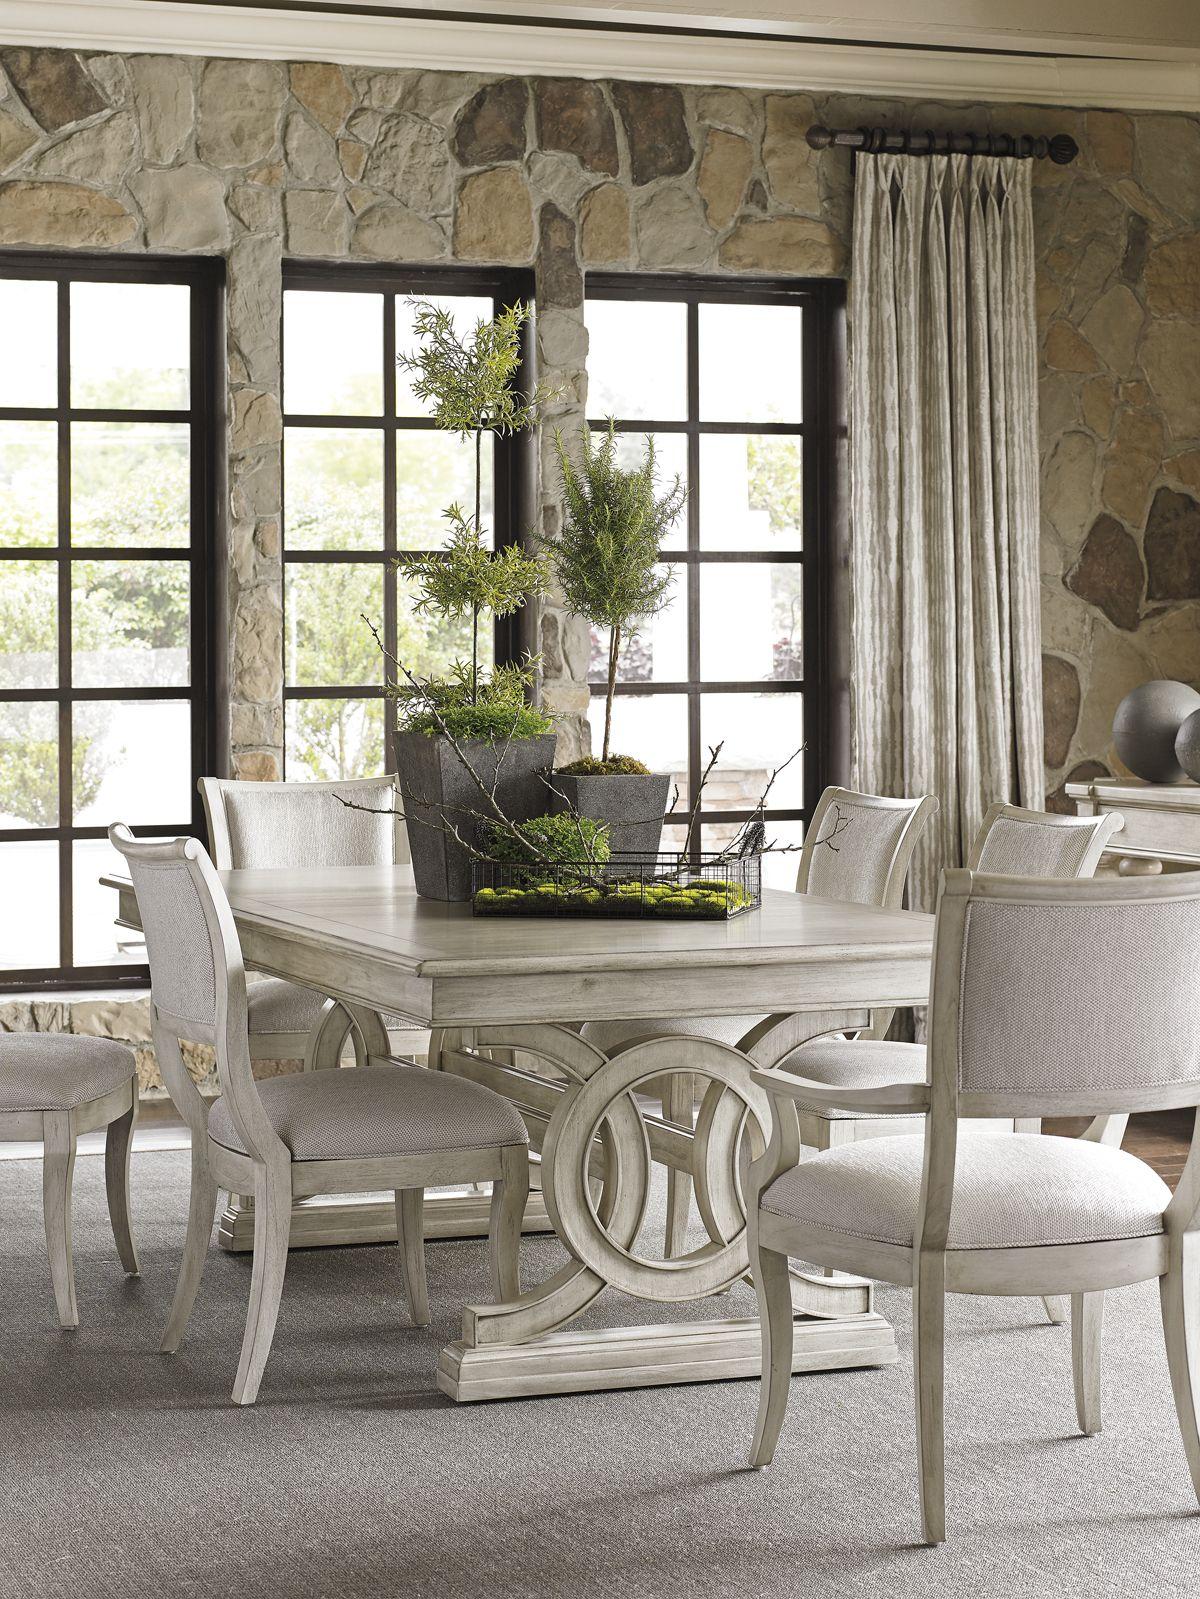 Oyster Bay Montauk Rectangular Dining Table | Lexington Home Brands  DIMENSIONSu2026